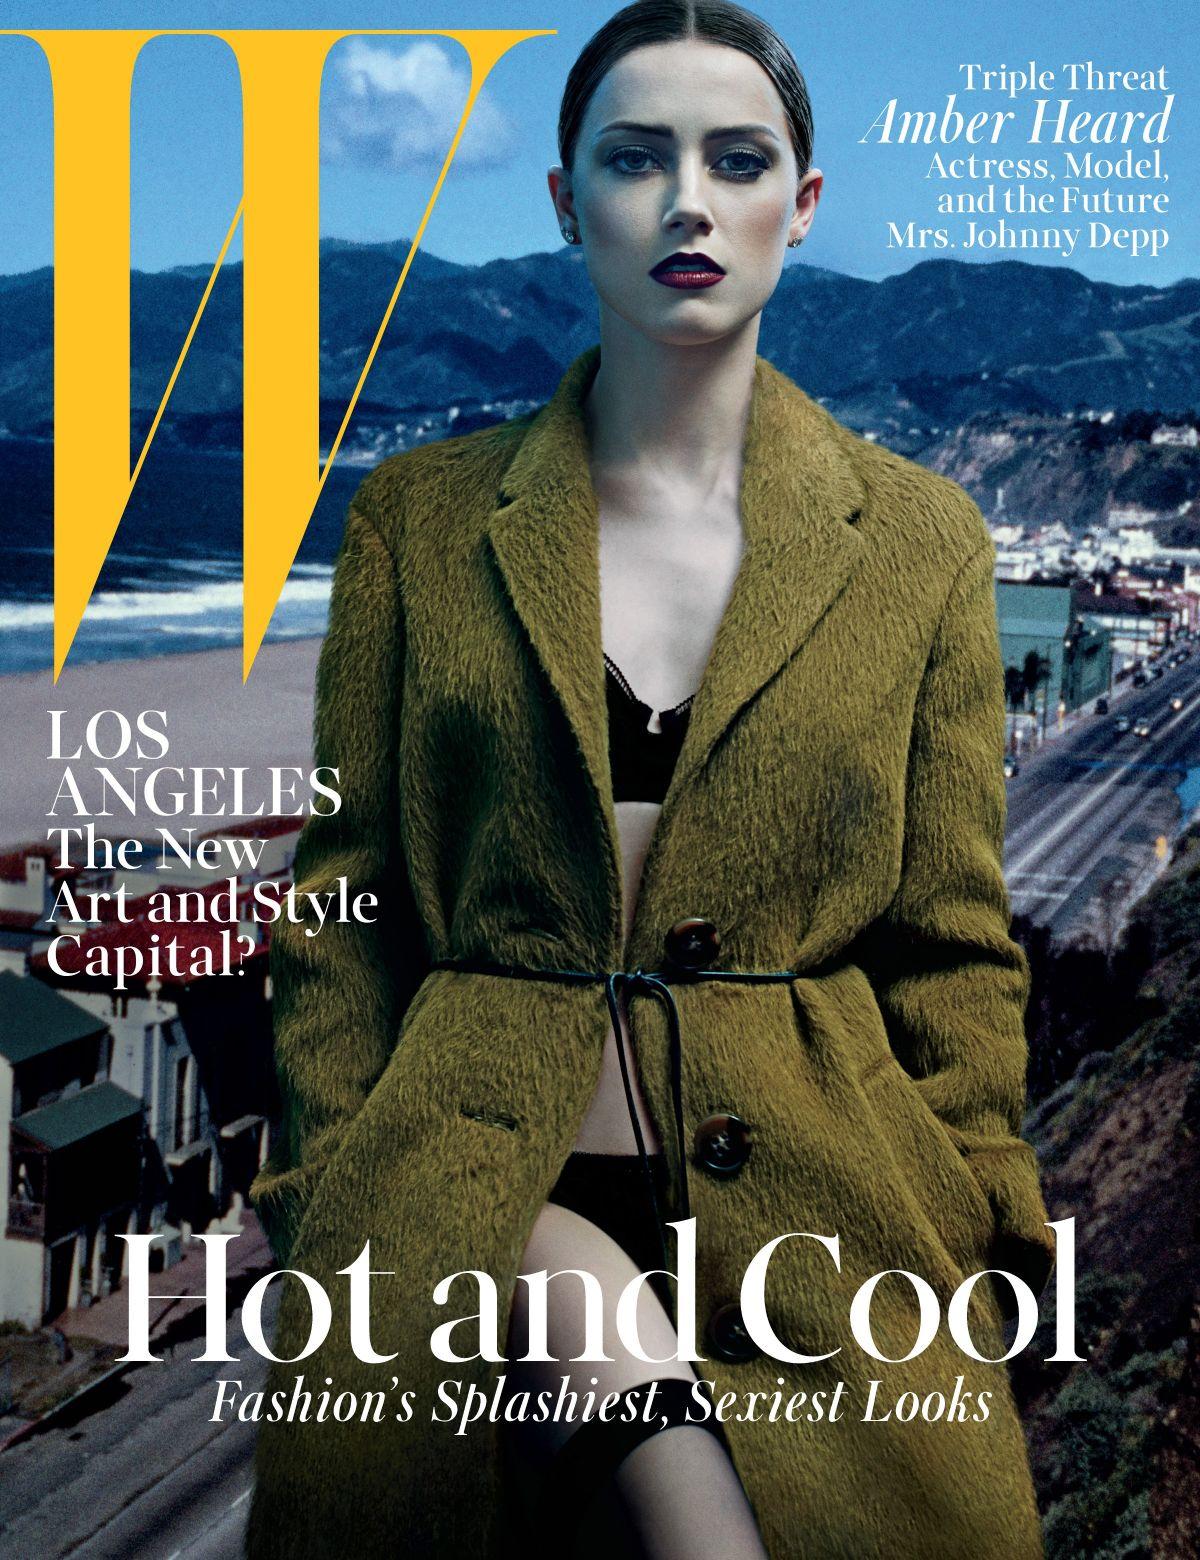 AMBER HEARD in W Magazine, June/July 2014 Issue